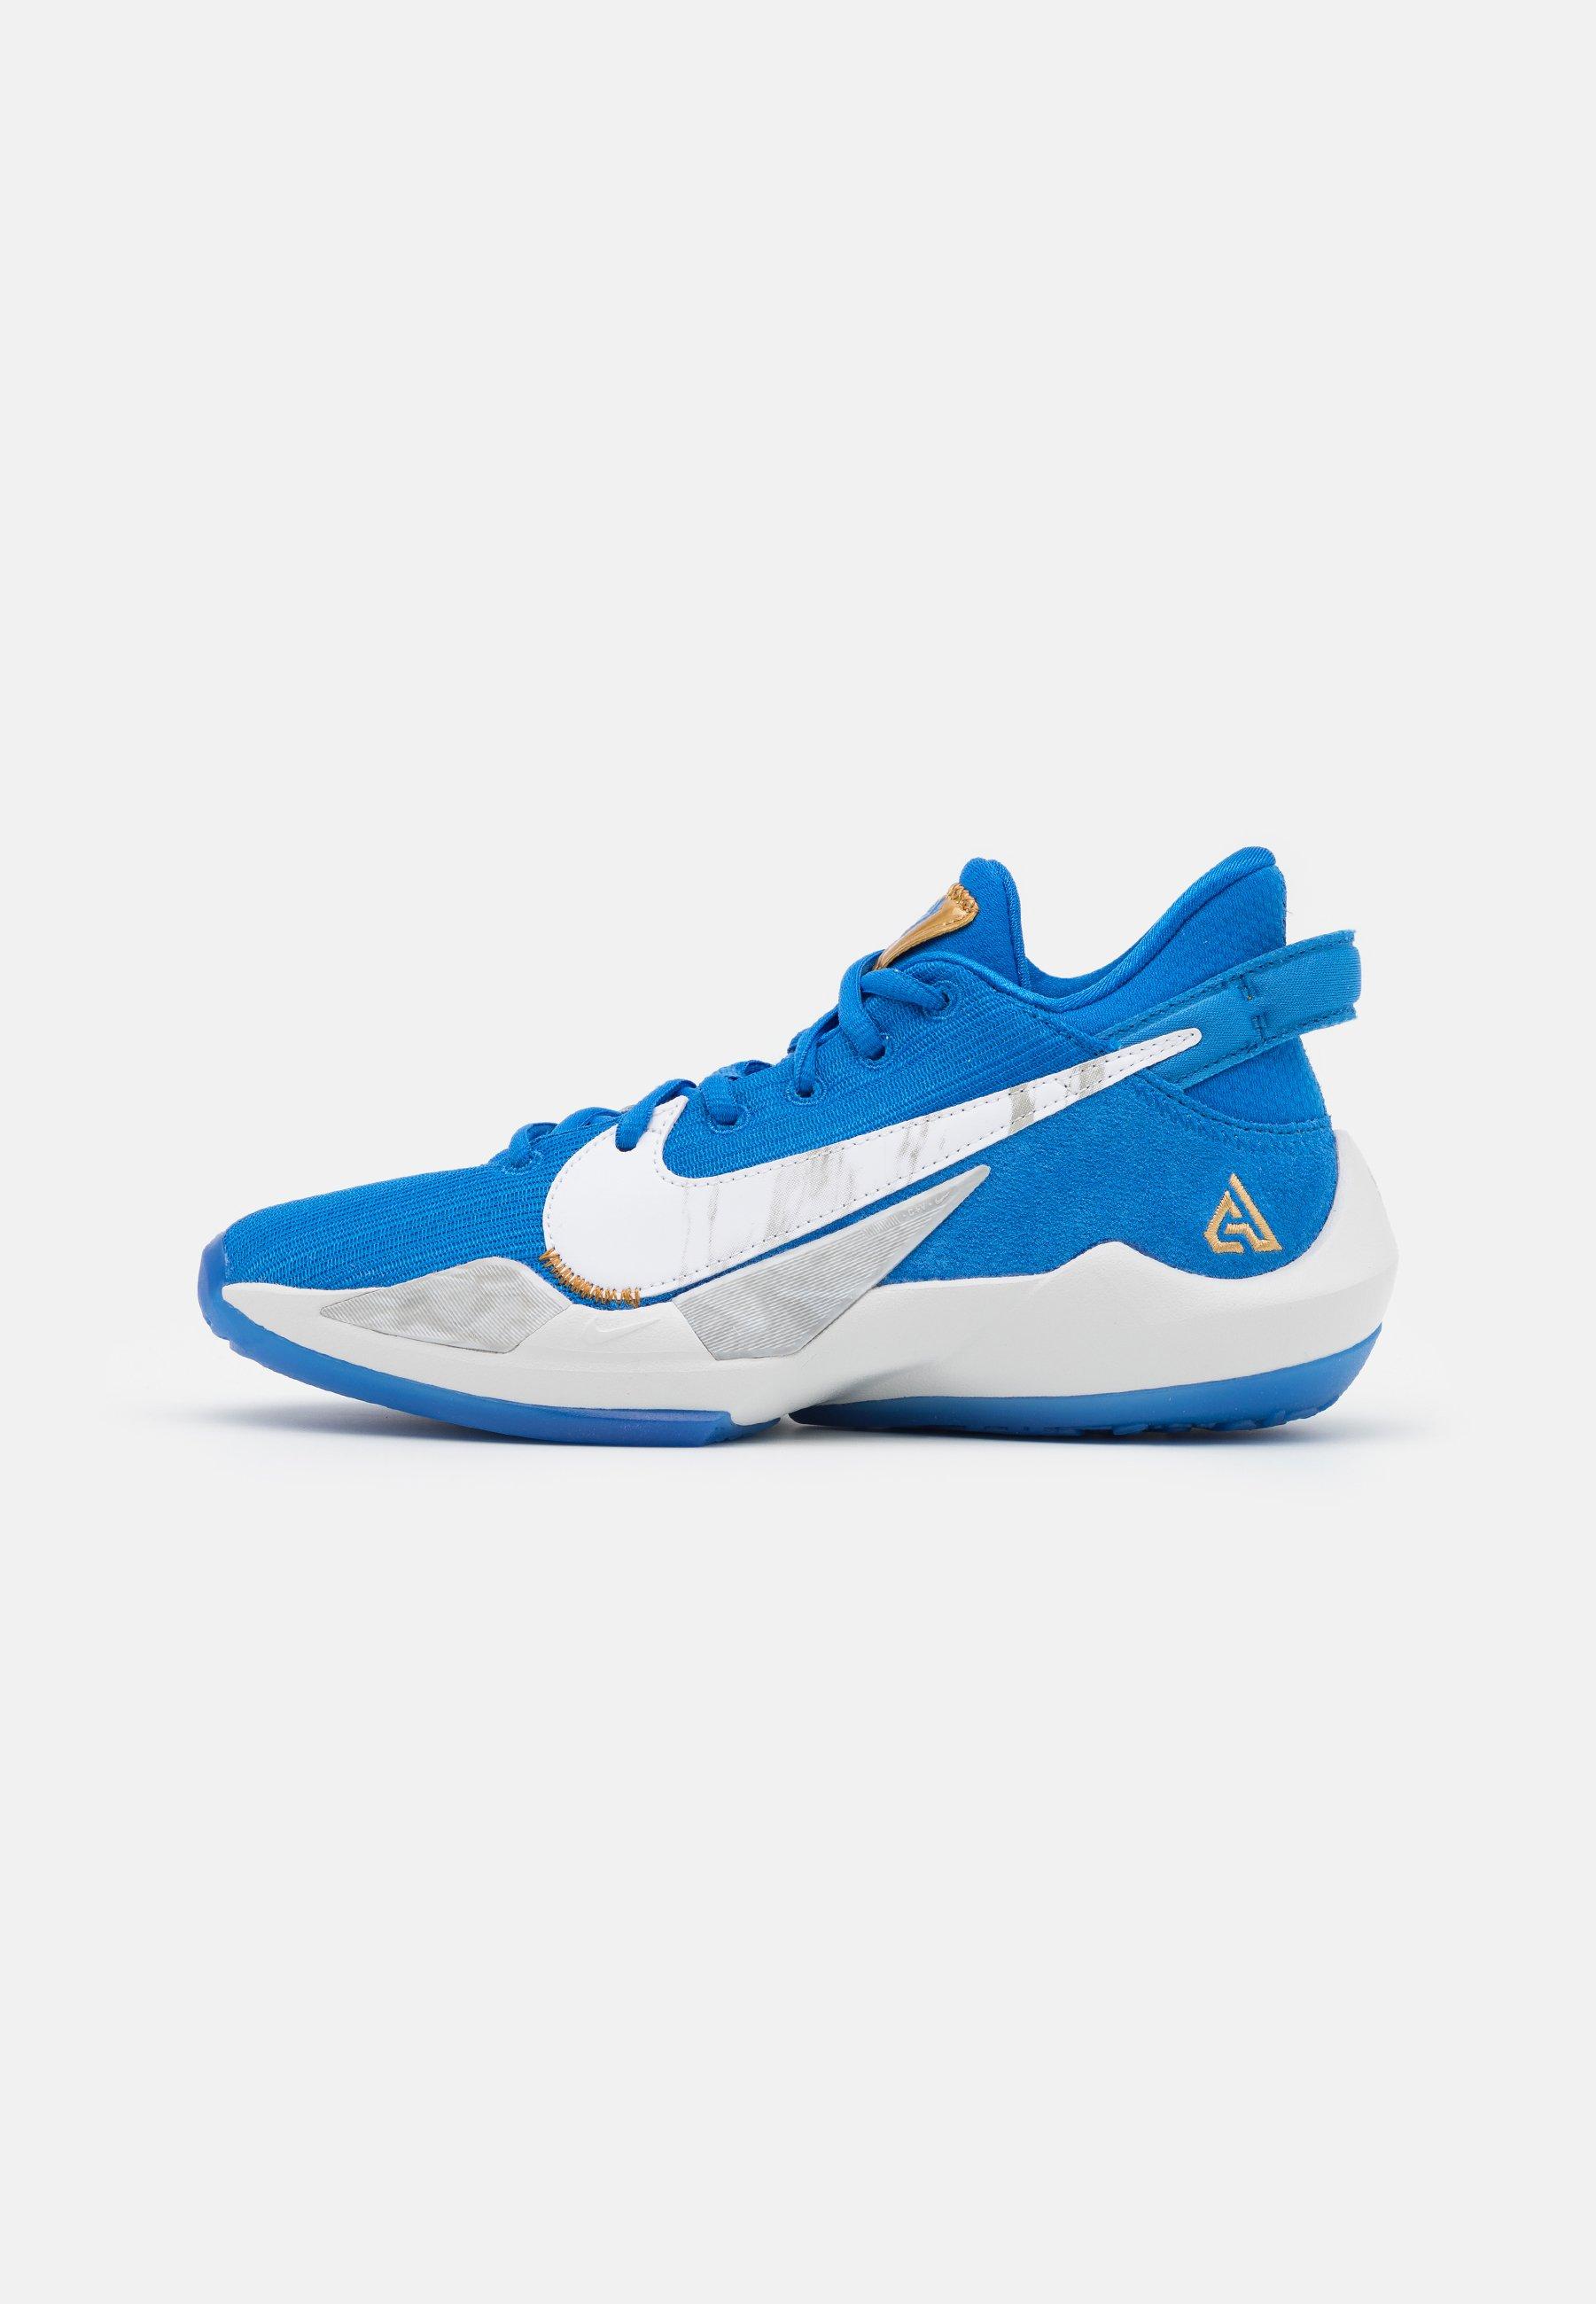 Kids FREAK 2 SE UNISEX - Basketball shoes